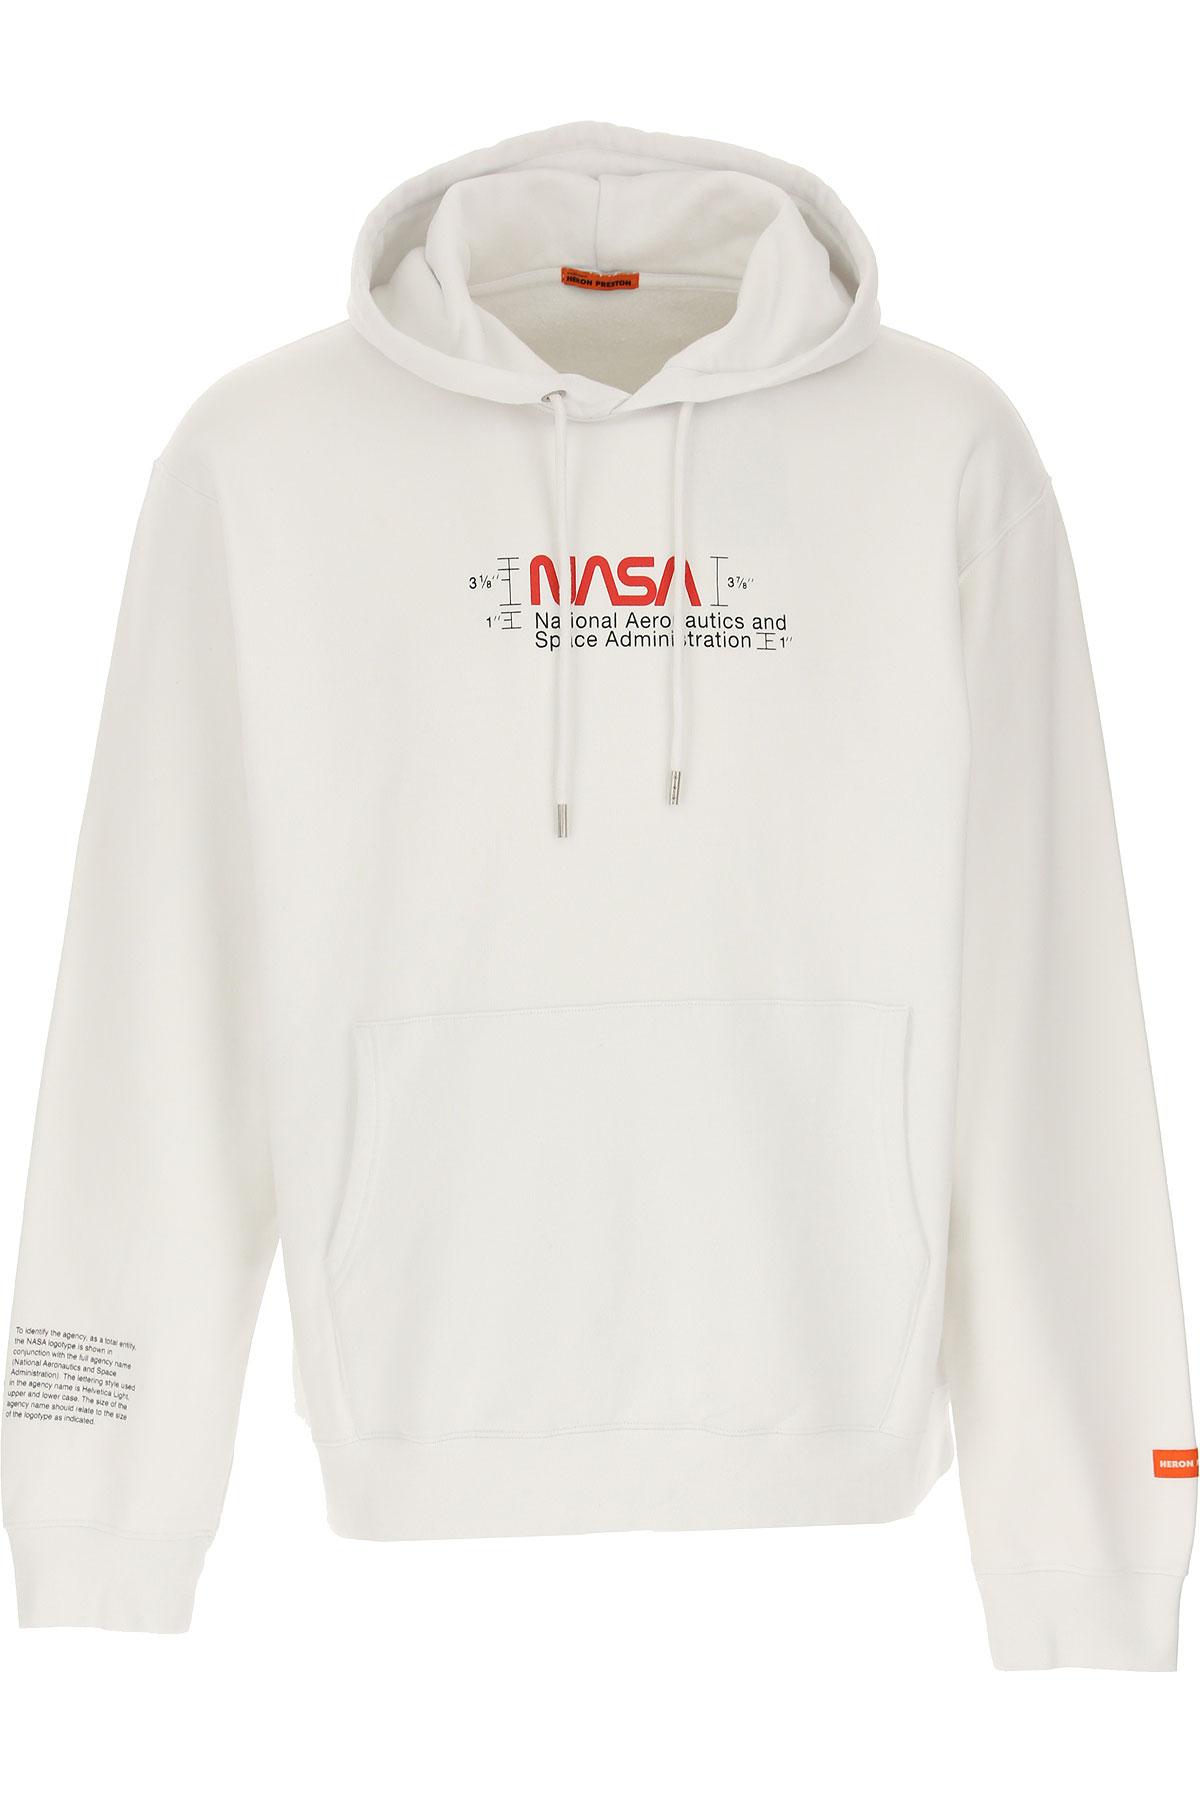 Heron Preston Sweatshirt for Men On Sale, White, Cotton, 2019, L XL